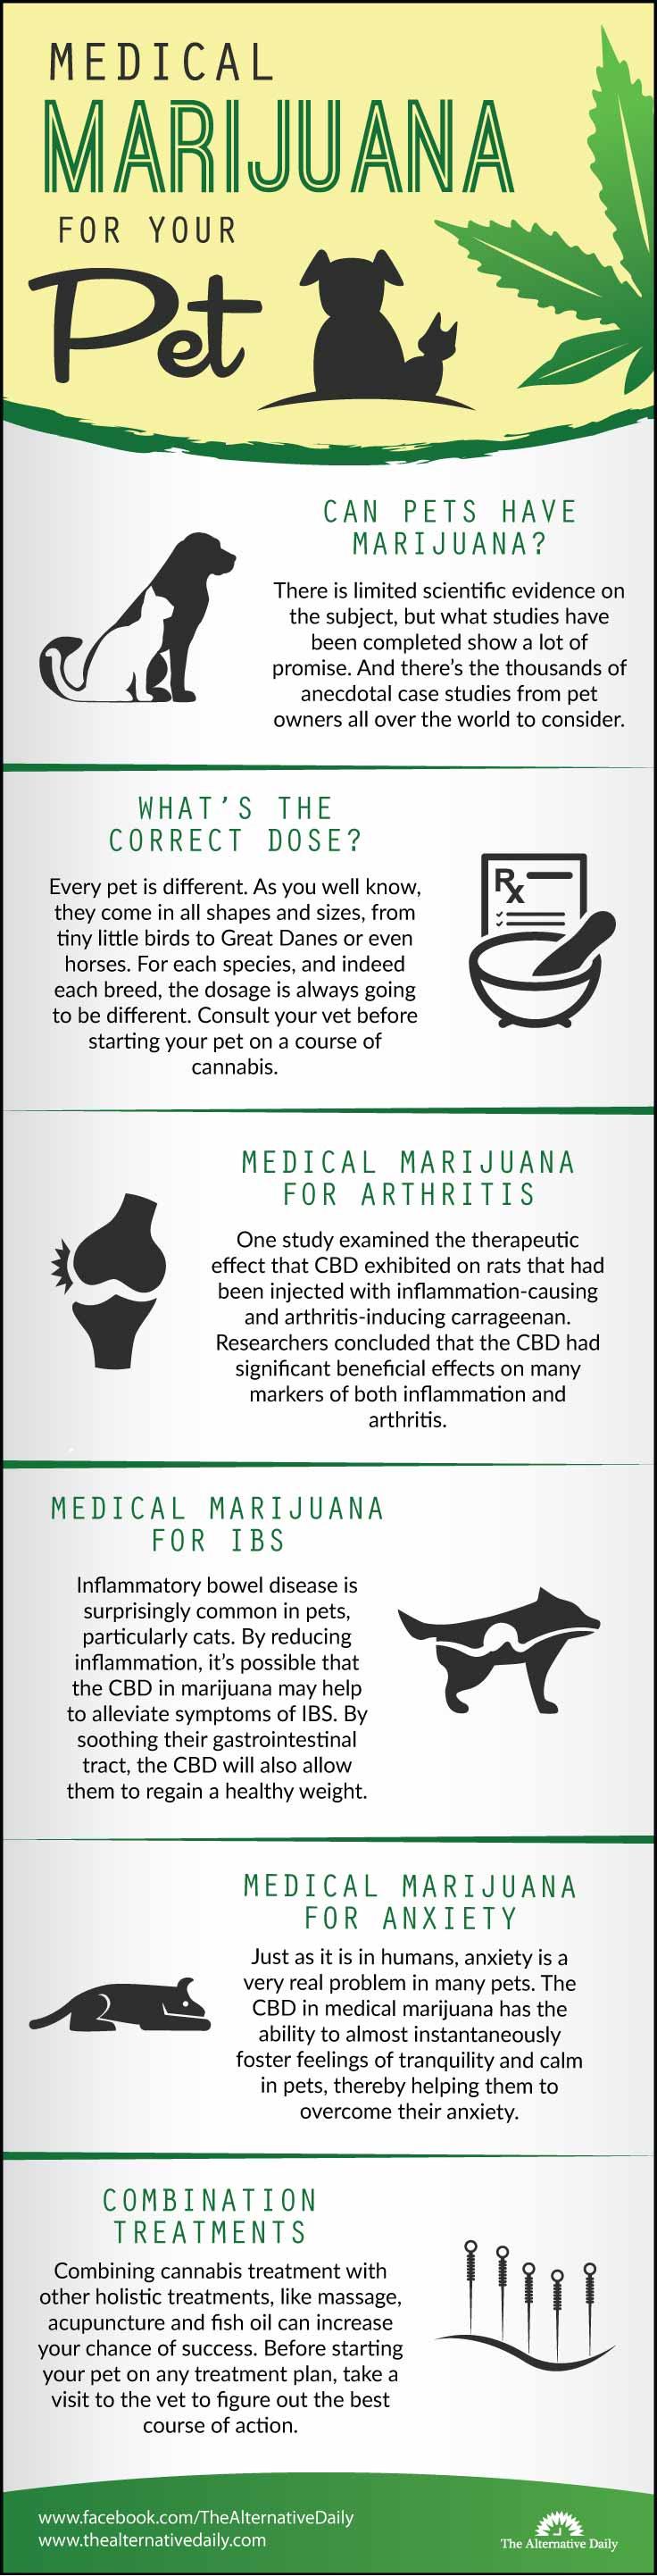 medical-marijuana-for-pets